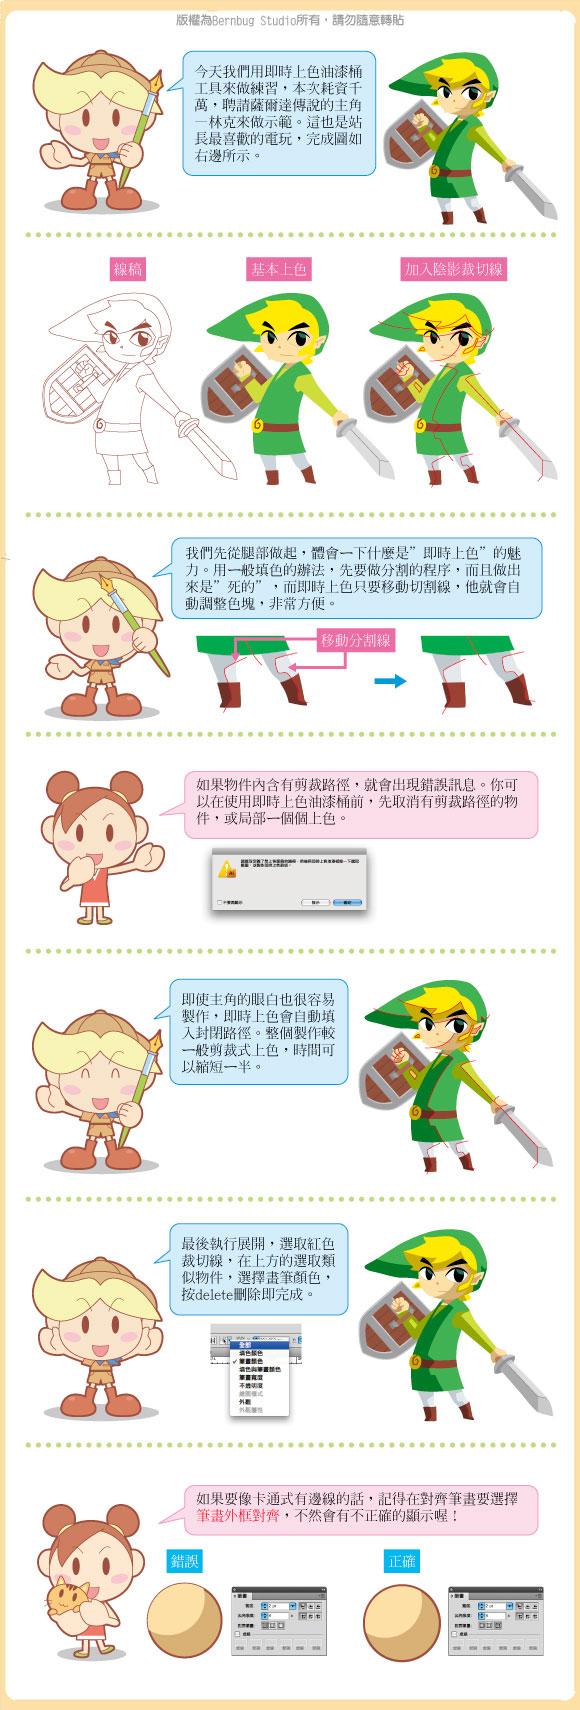 lesson8.jpg